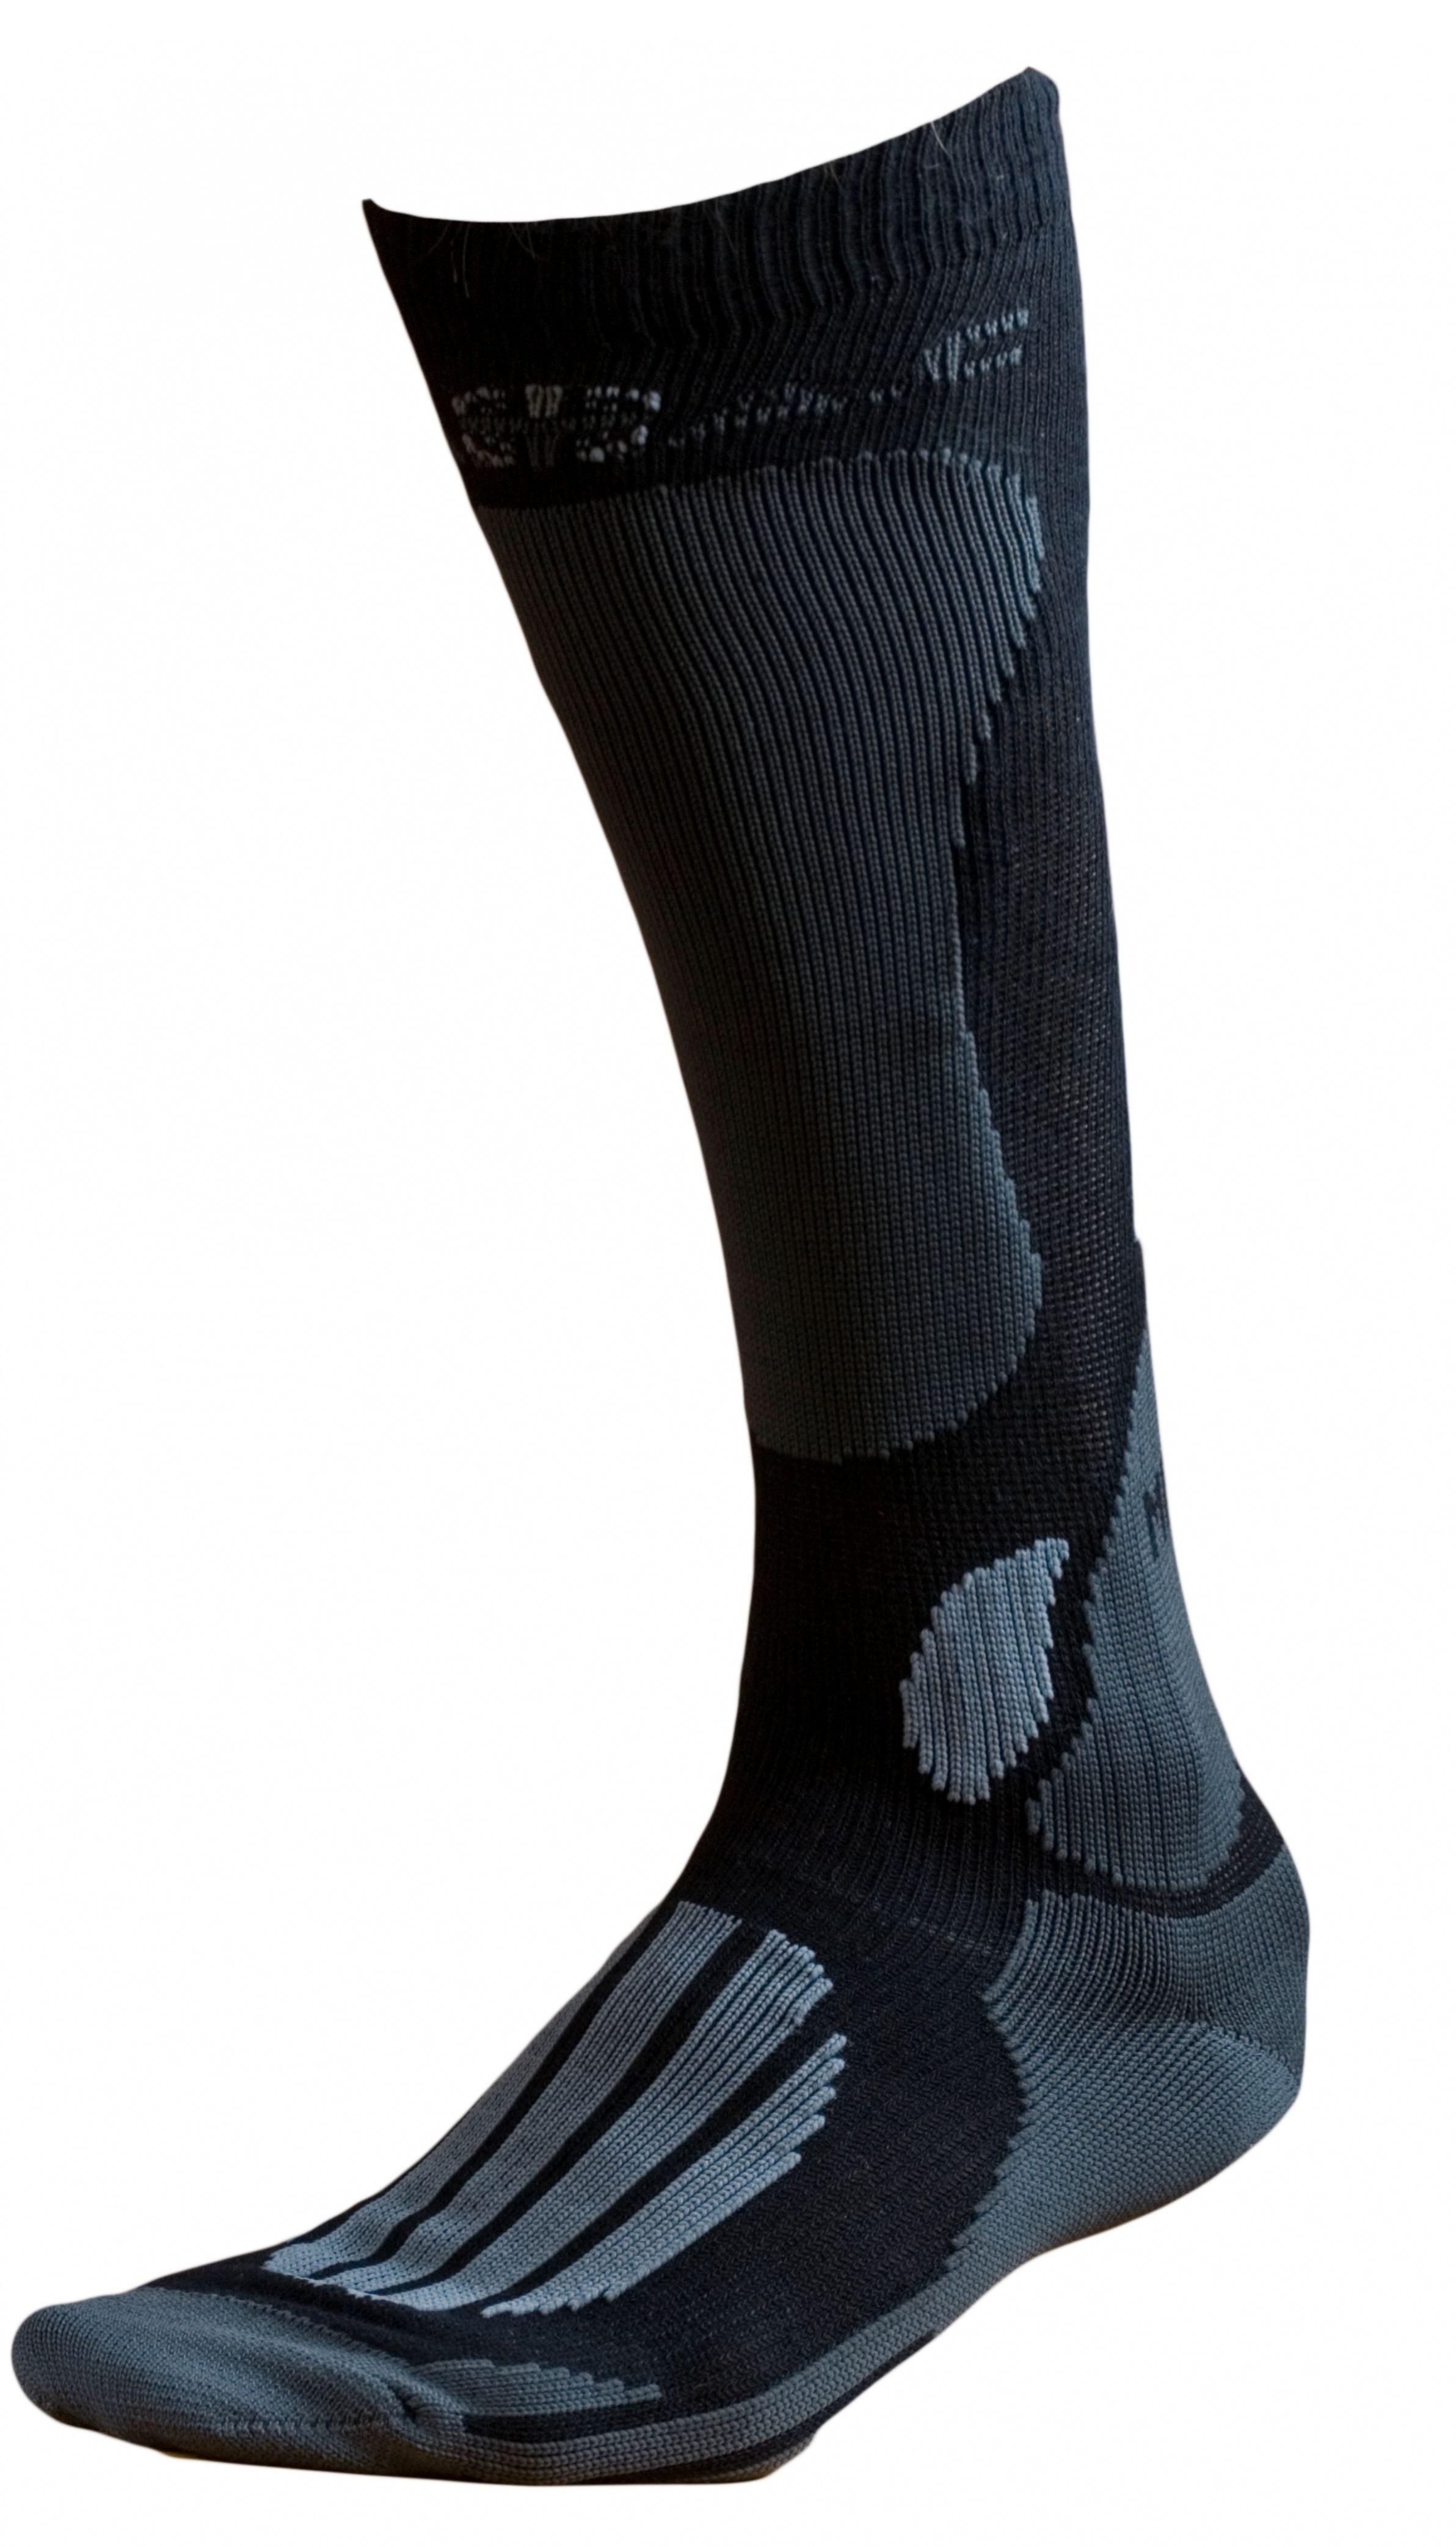 Ponožky BATAC Mission MI01 vel. 42-43 - black/grey